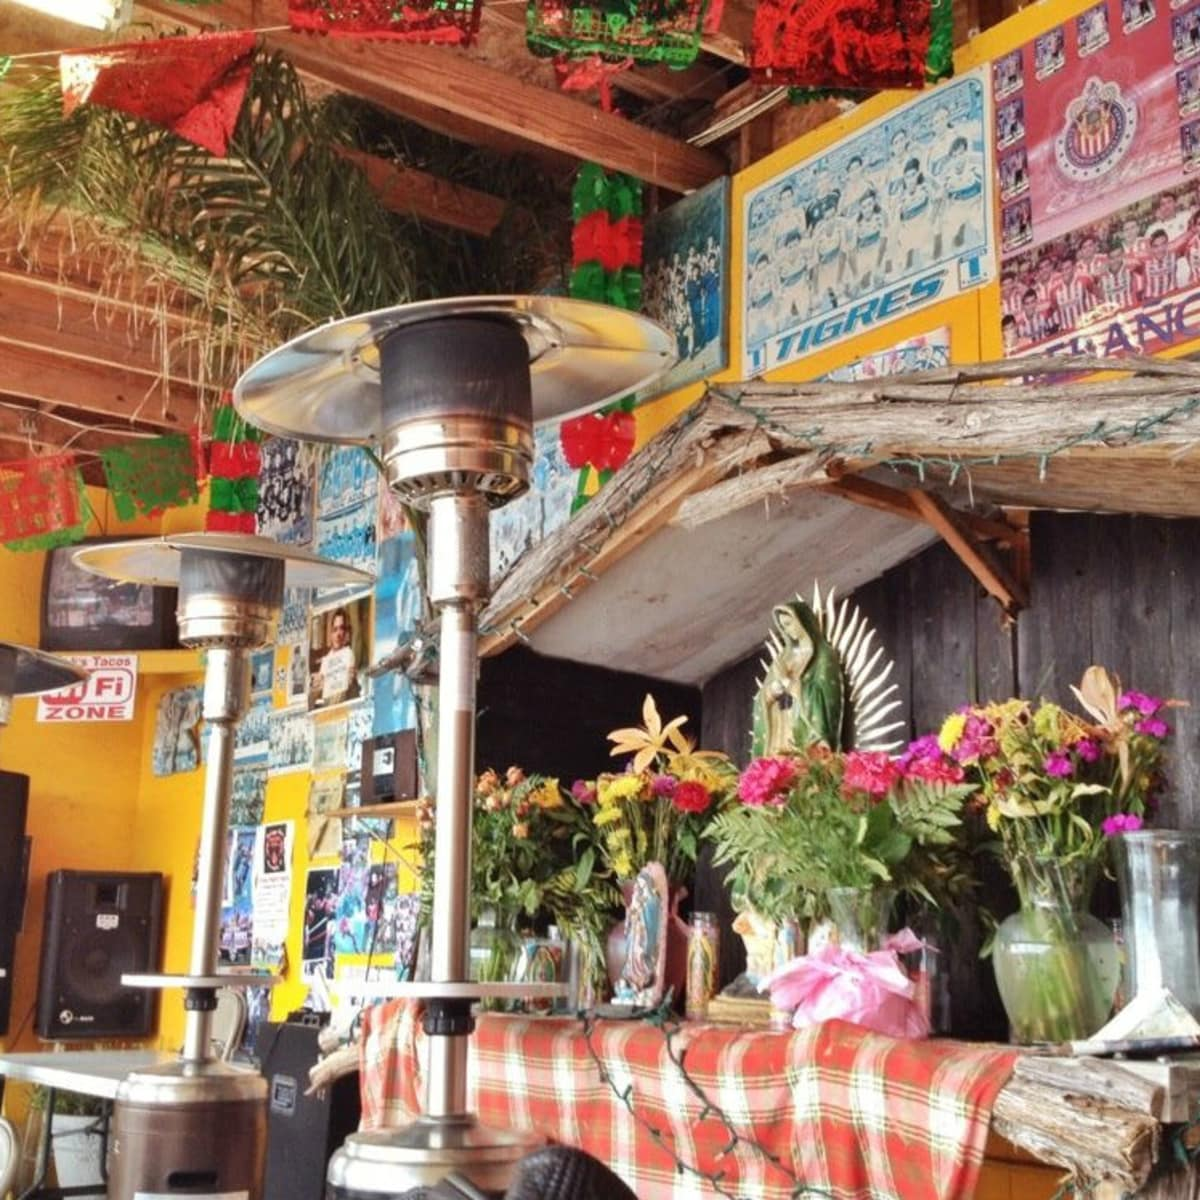 Erick's Tacos patio interior